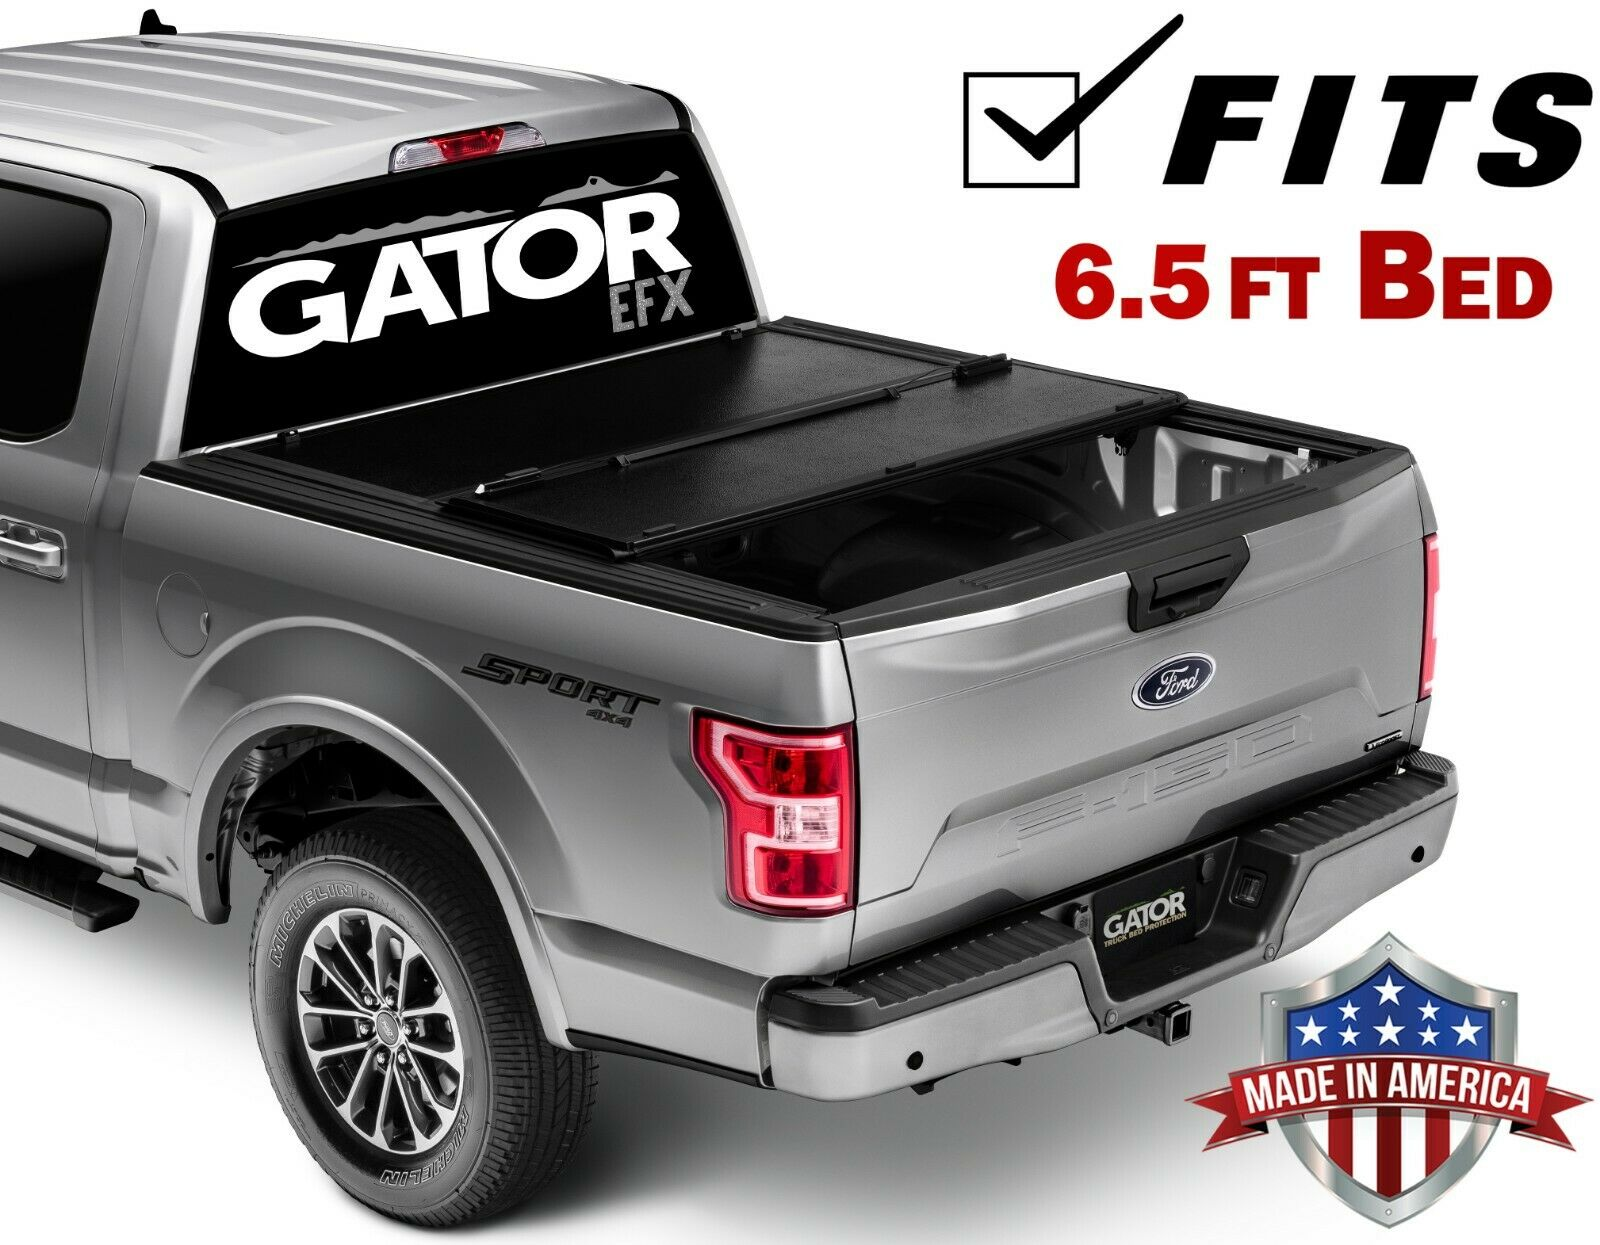 Gator Efx Hard Tri Fold Fits 2014 2018 Chevy Silverado Gmc Sierra 6 5 Ft Bed Only Tonneau Truck Bed Cover Made In The Usa Gc14019 Walmart Com Walmart Com